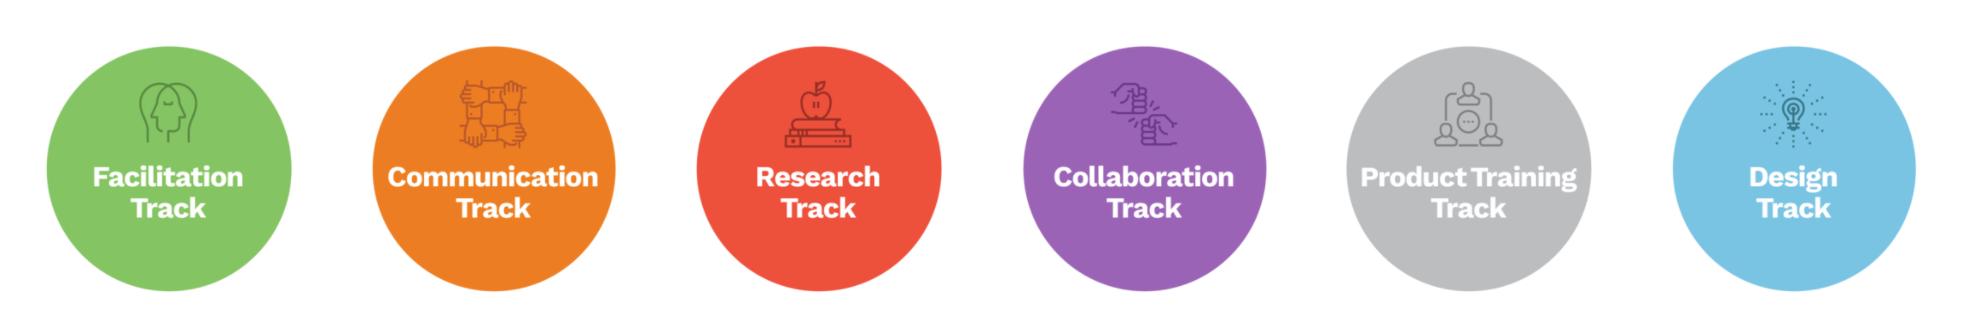 Professional Development program tracks.png